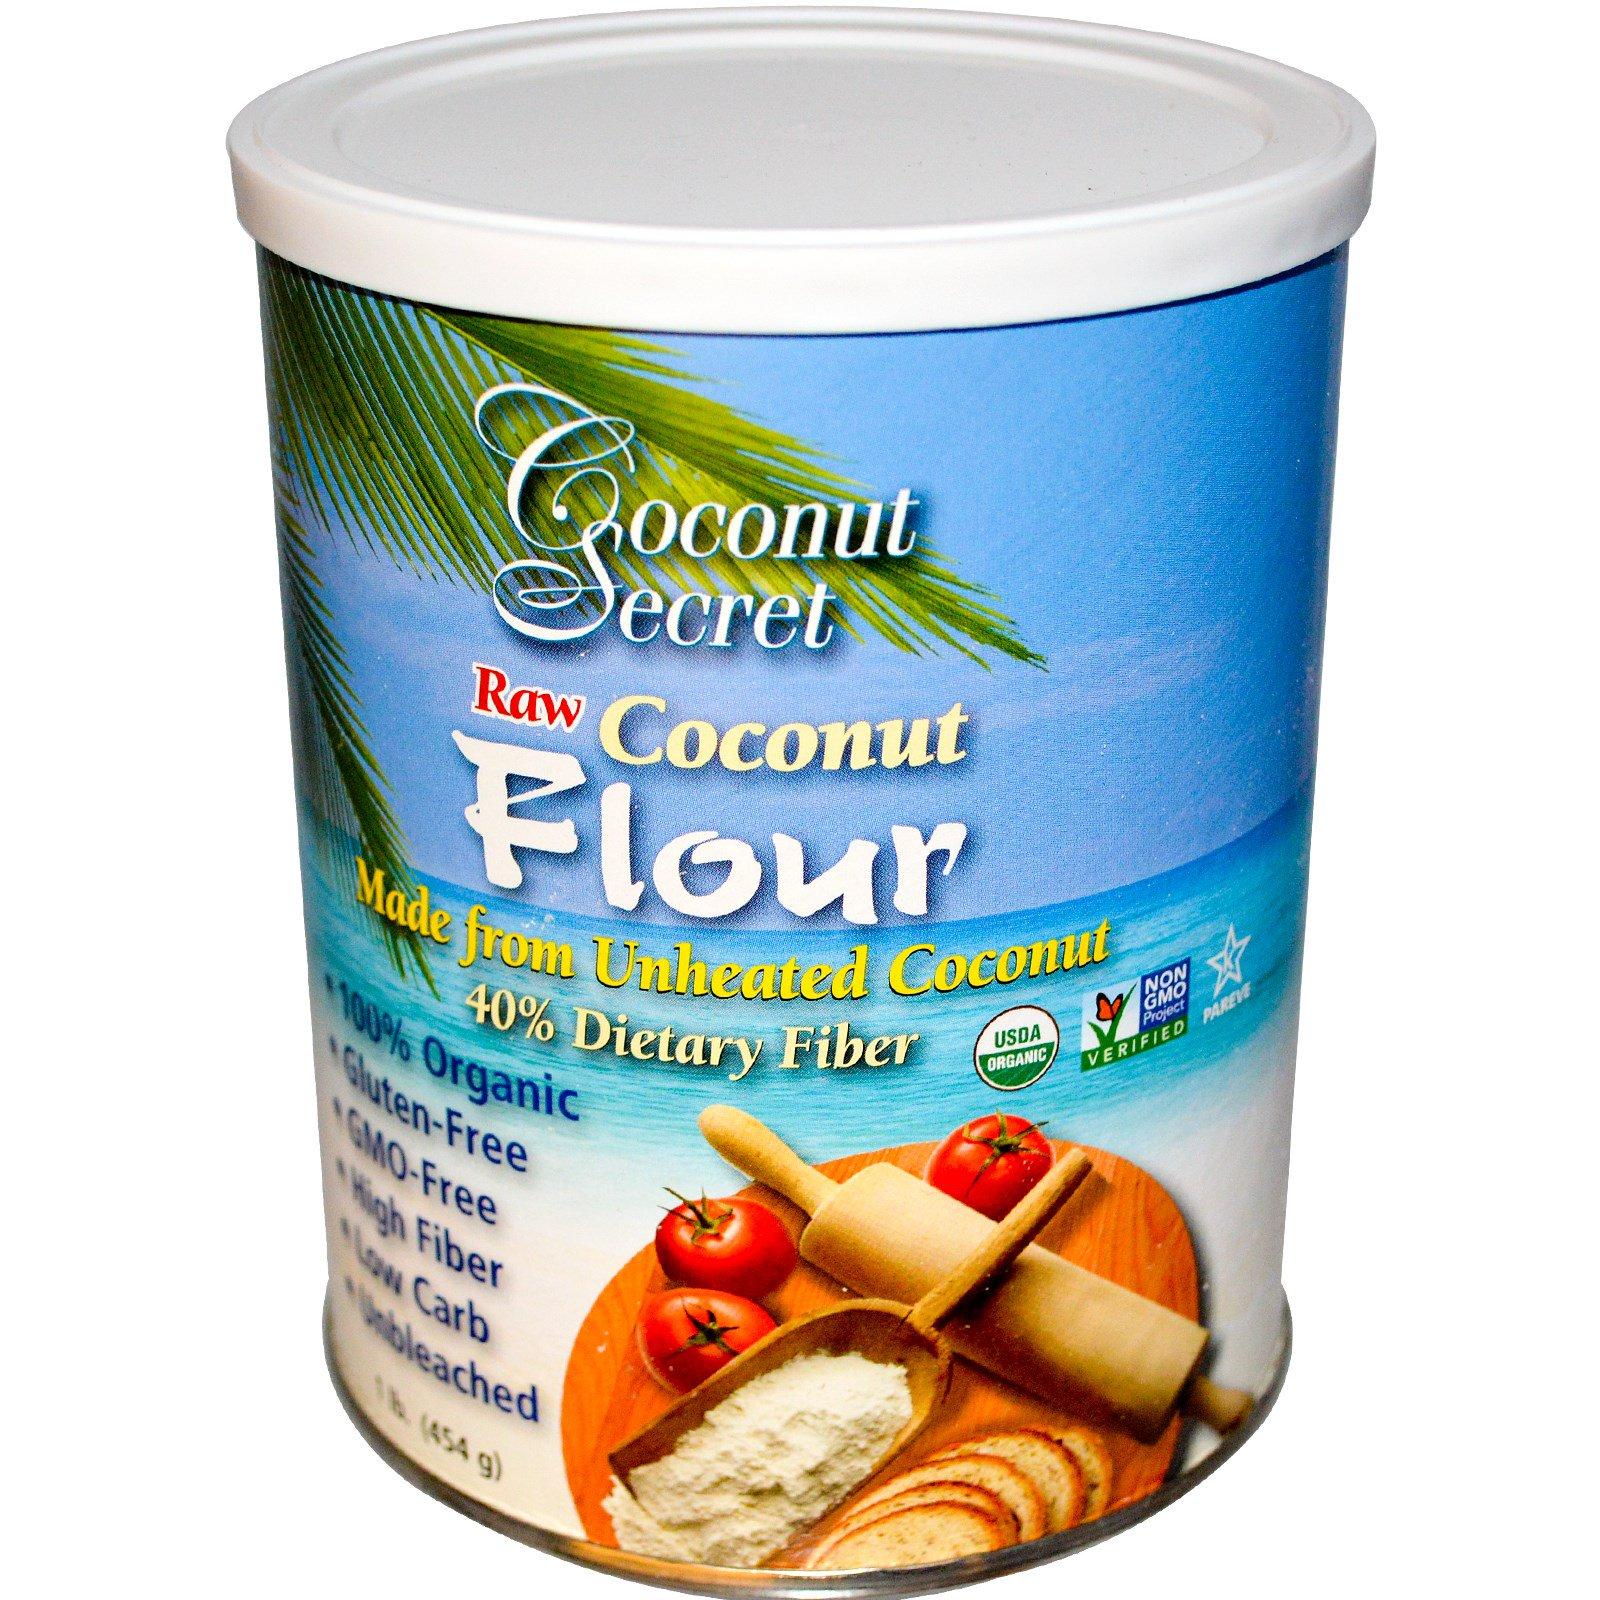 Coconut Secret, Raw Coconut Flour, 1 lb (454 g) - iHerb.com